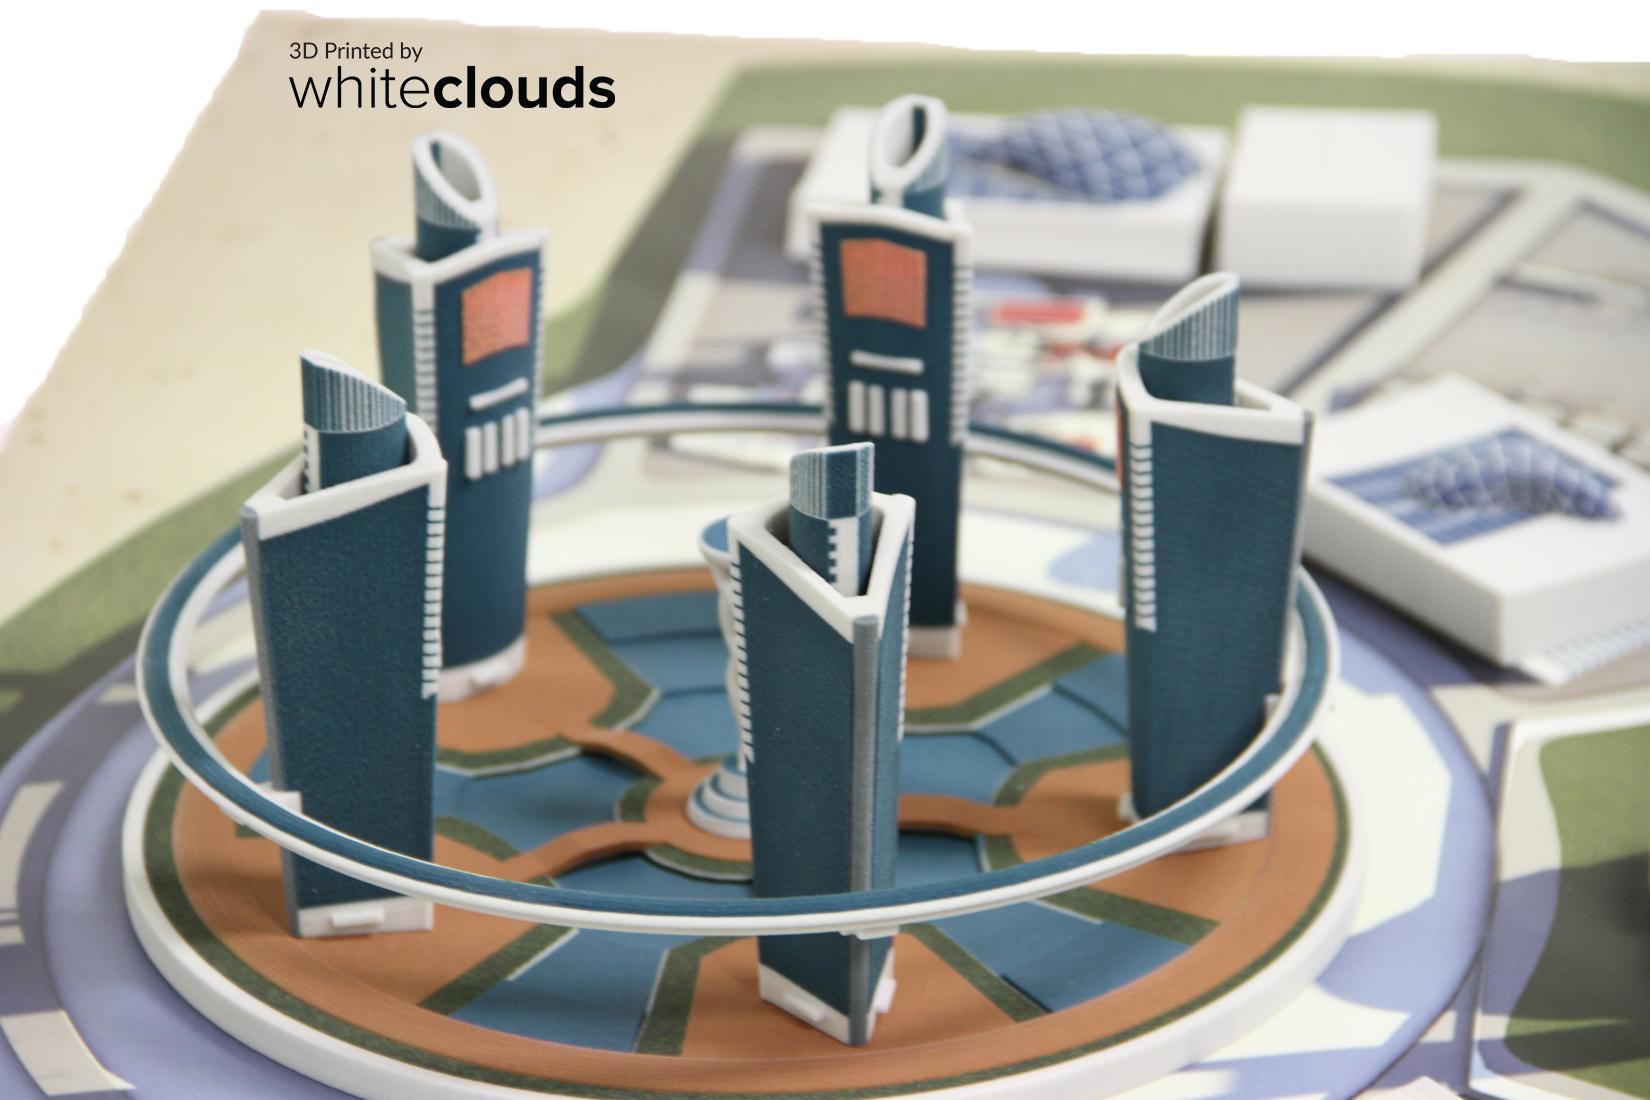 3D-Printed-WhiteClouds-Future-Building-Architectural-Dubai-Future-4.jpg